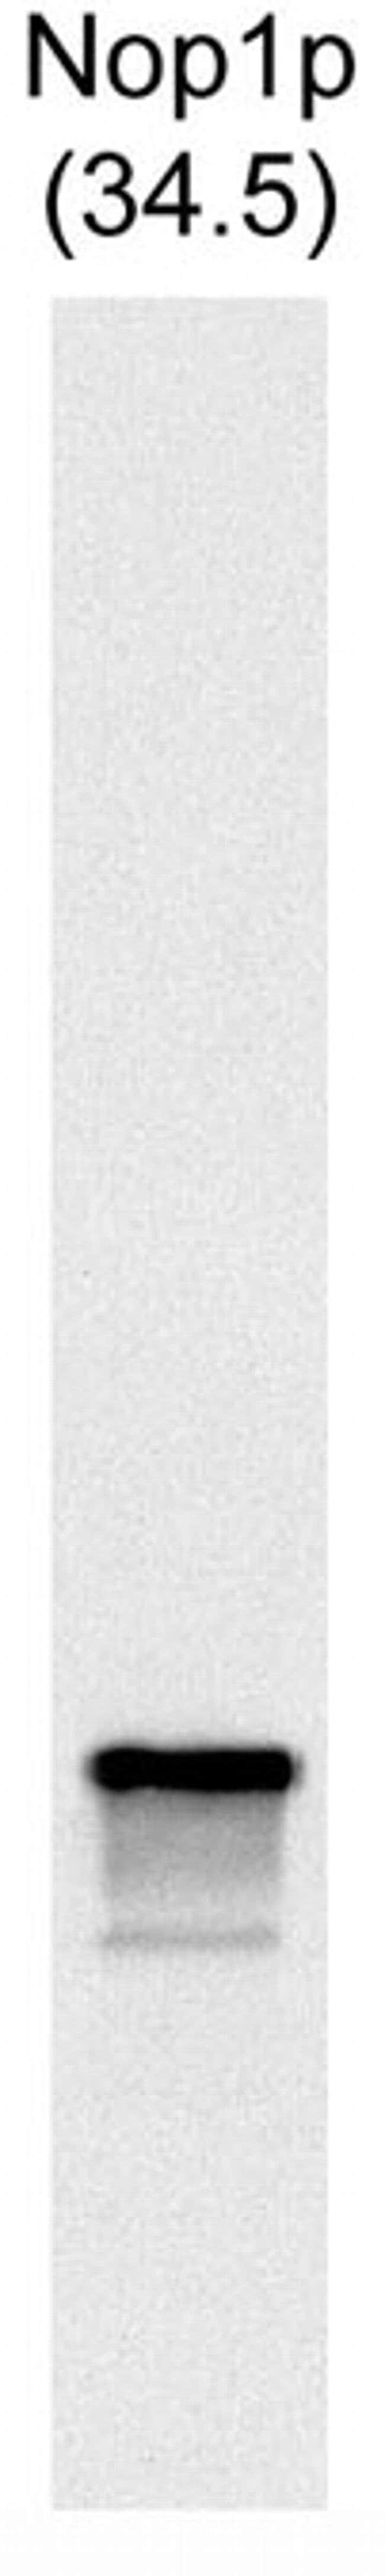 NOP1 Mouse anti-Yeast, Clone: 28F2, Invitrogen 500 µL; Unconjugated